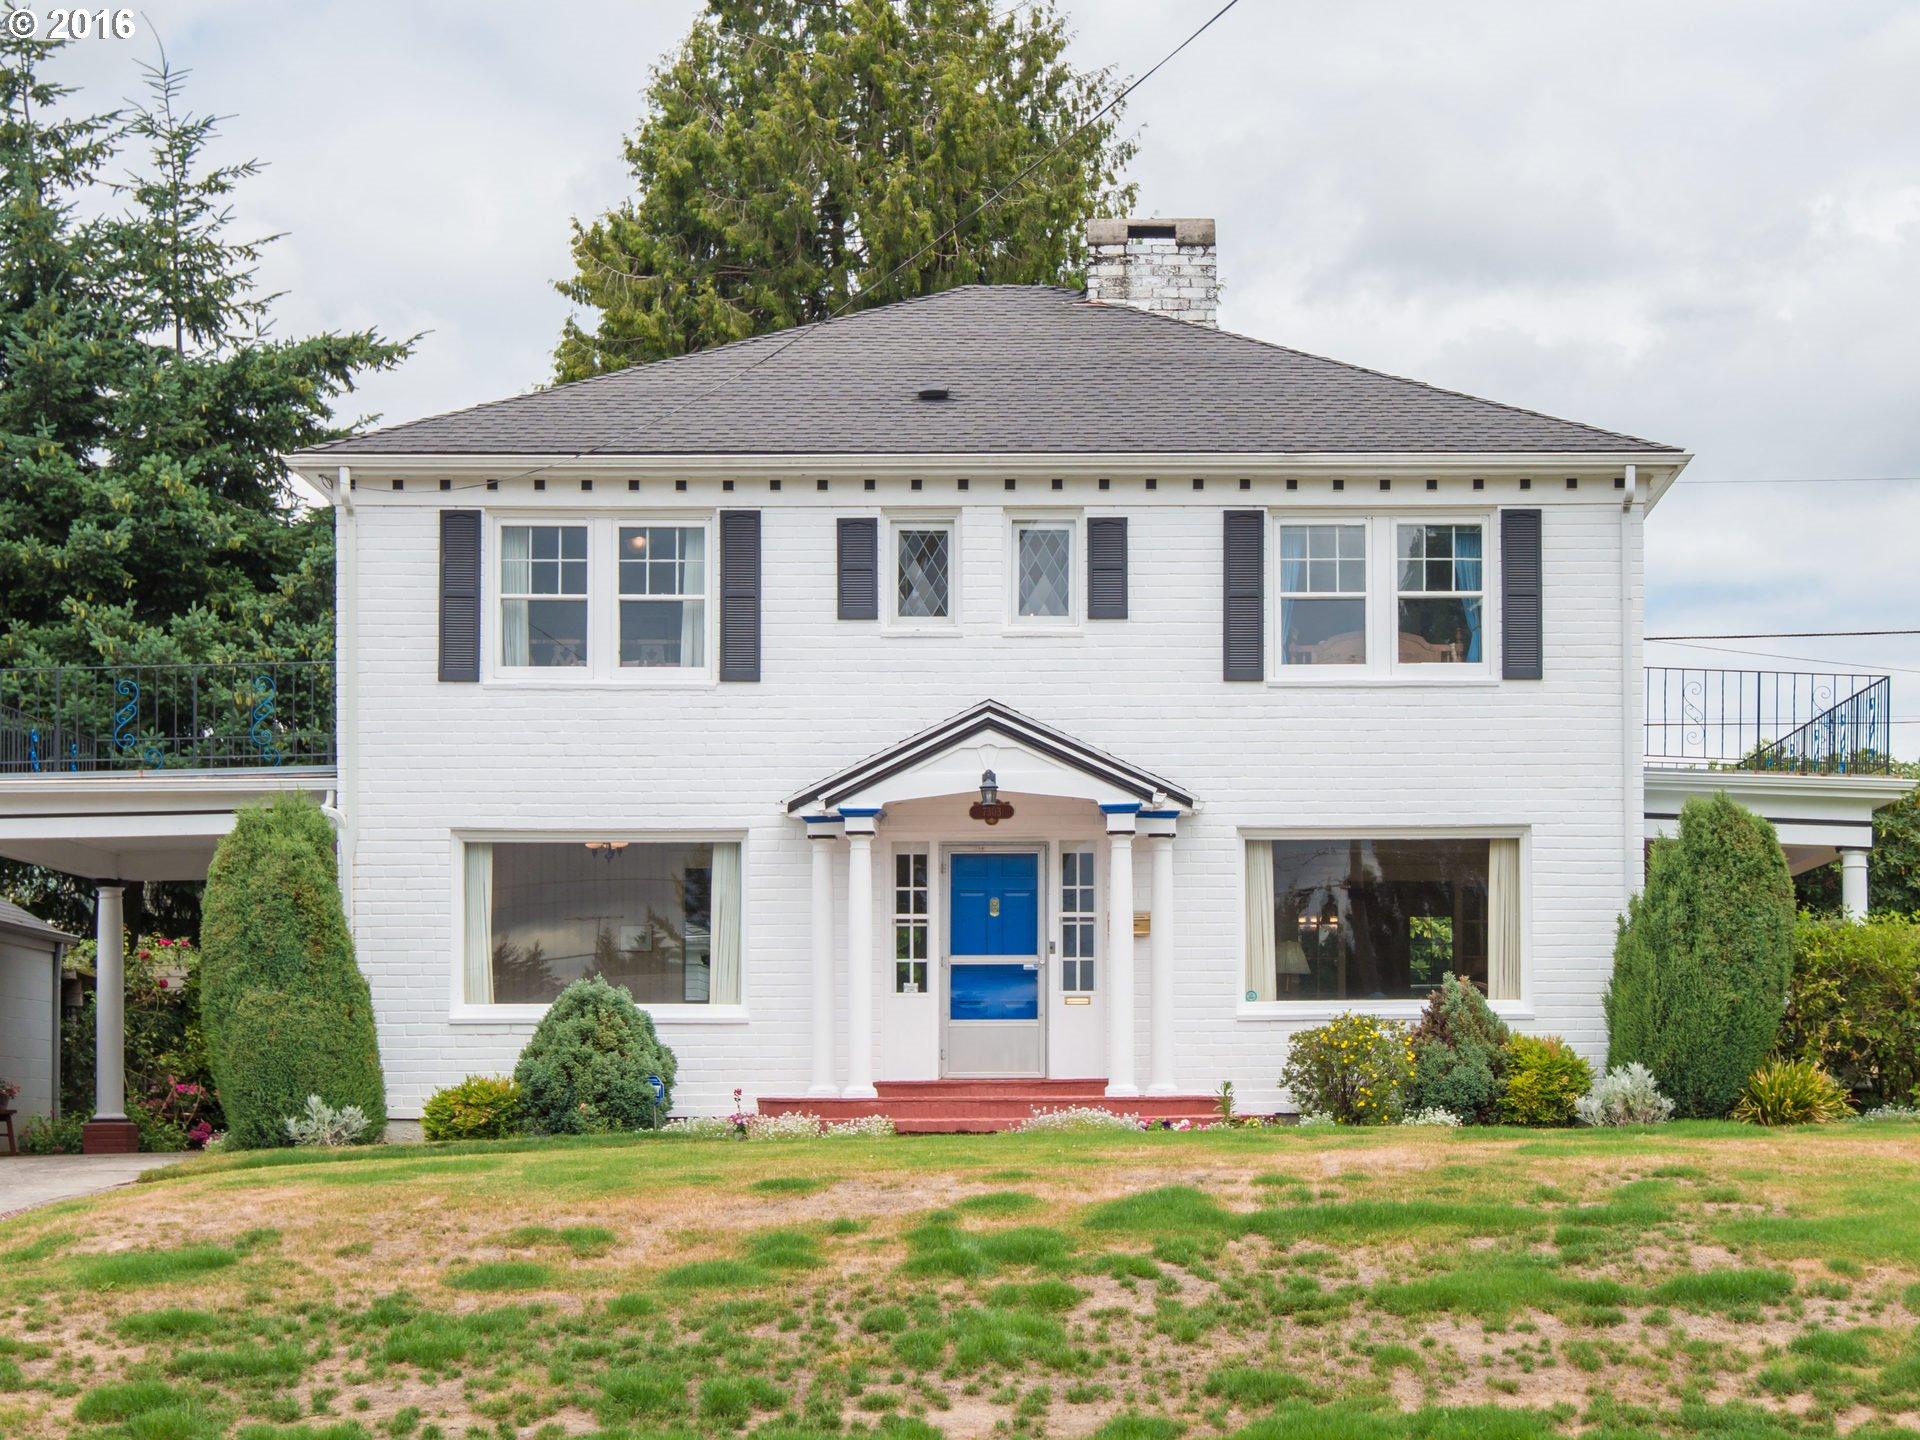 Property for sale at 7303 NE SACRAMENTO ST, Portland,  OR 97213